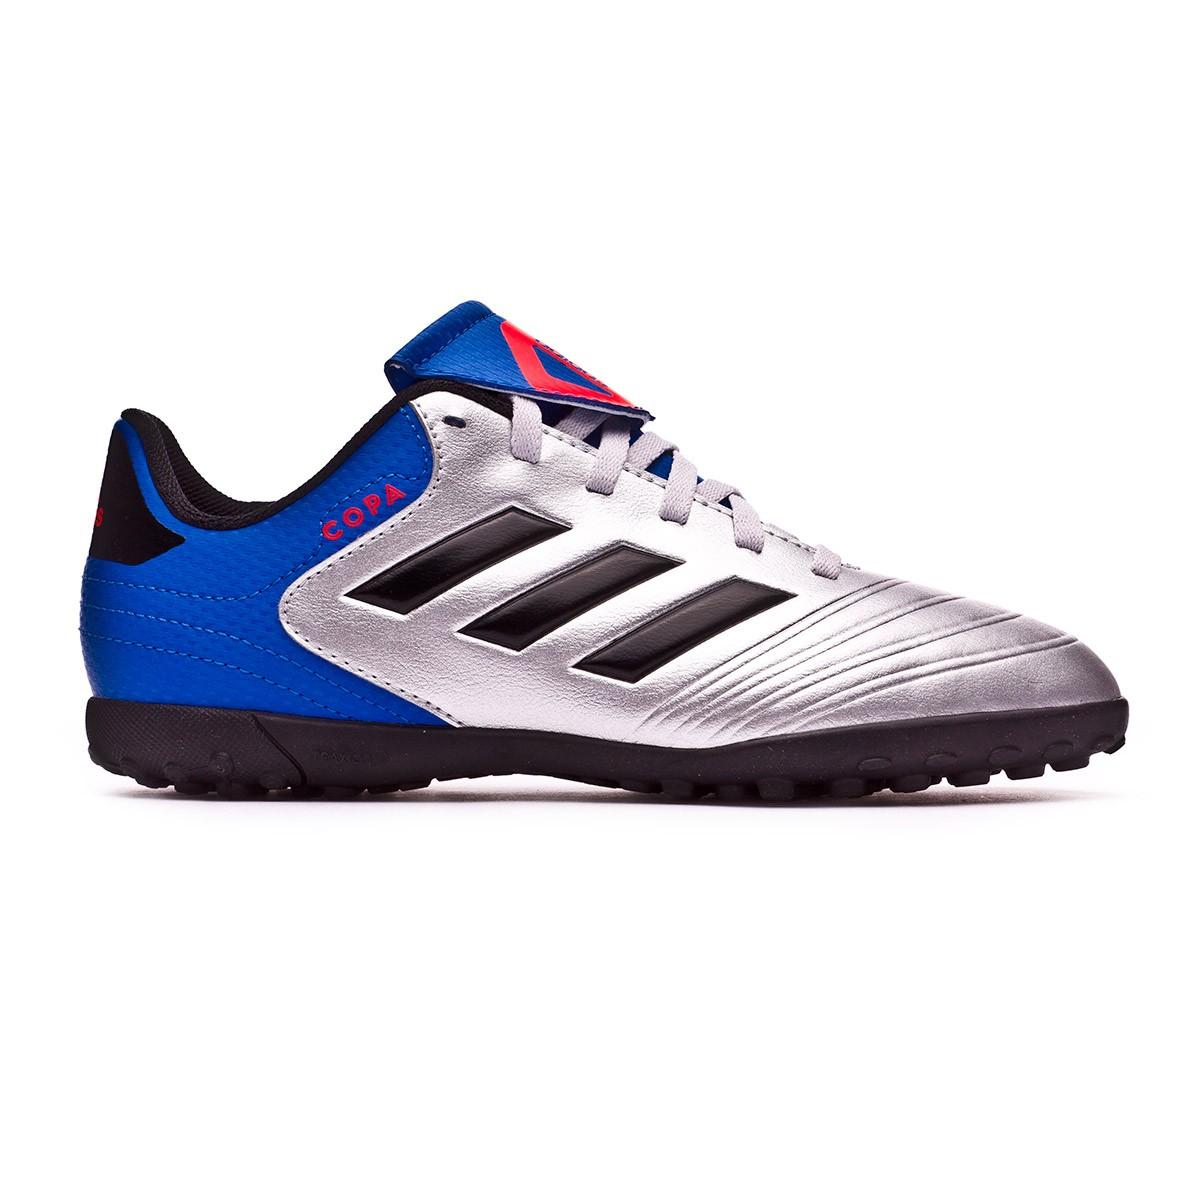 cff890985196 Football Boot adidas Kids Copa Tango 18.4 Turf Silver metallic-Core black- Football blue - Football store Fútbol Emotion